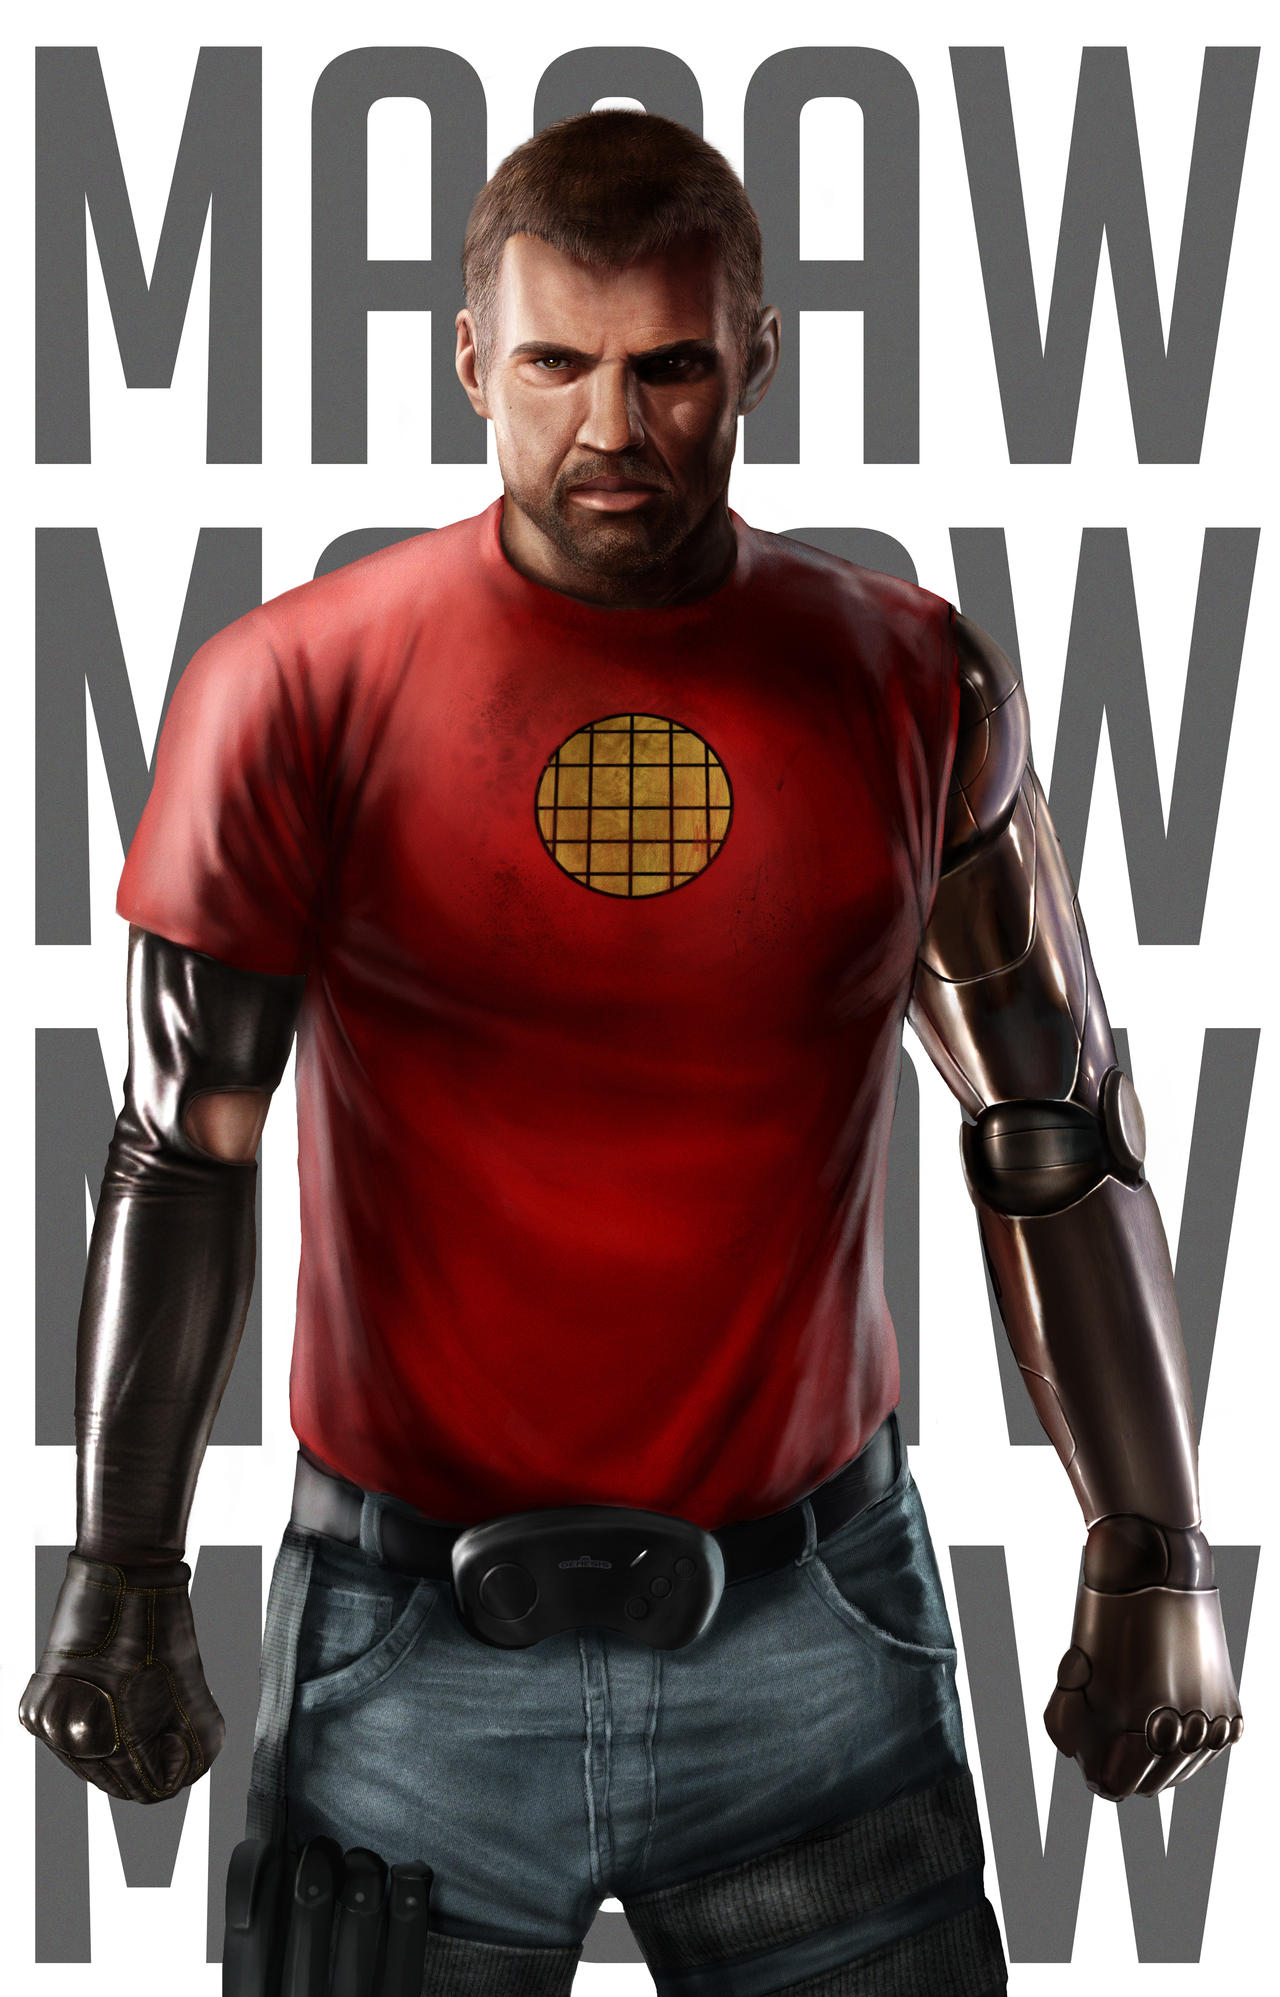 MACAW MACAW MACAW MACAW MACAW by SharpWriter